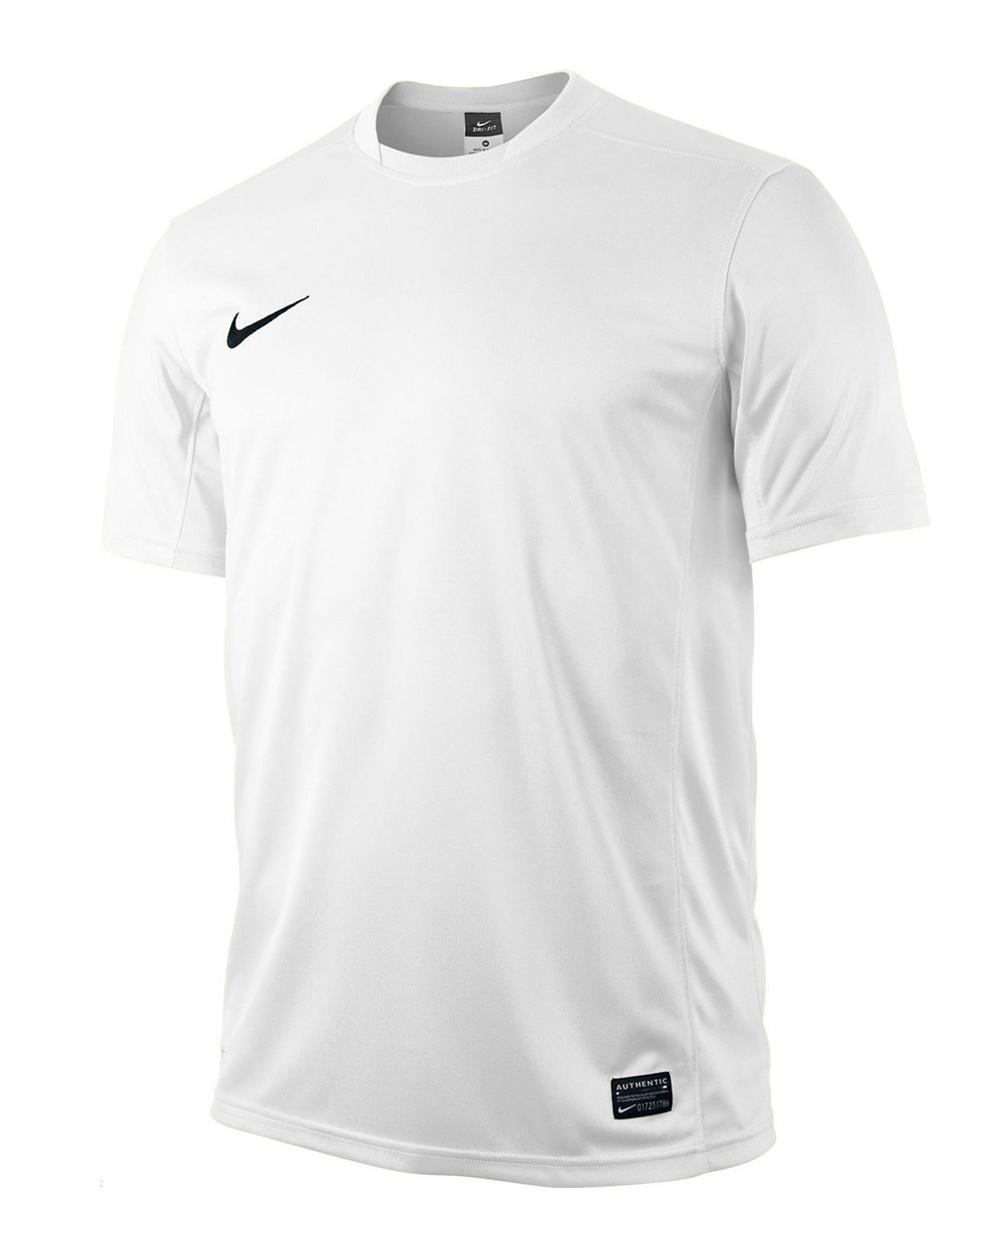 Park Letras Camiseta Kids Y Numeros Futbol Nike Vi pSUMzV